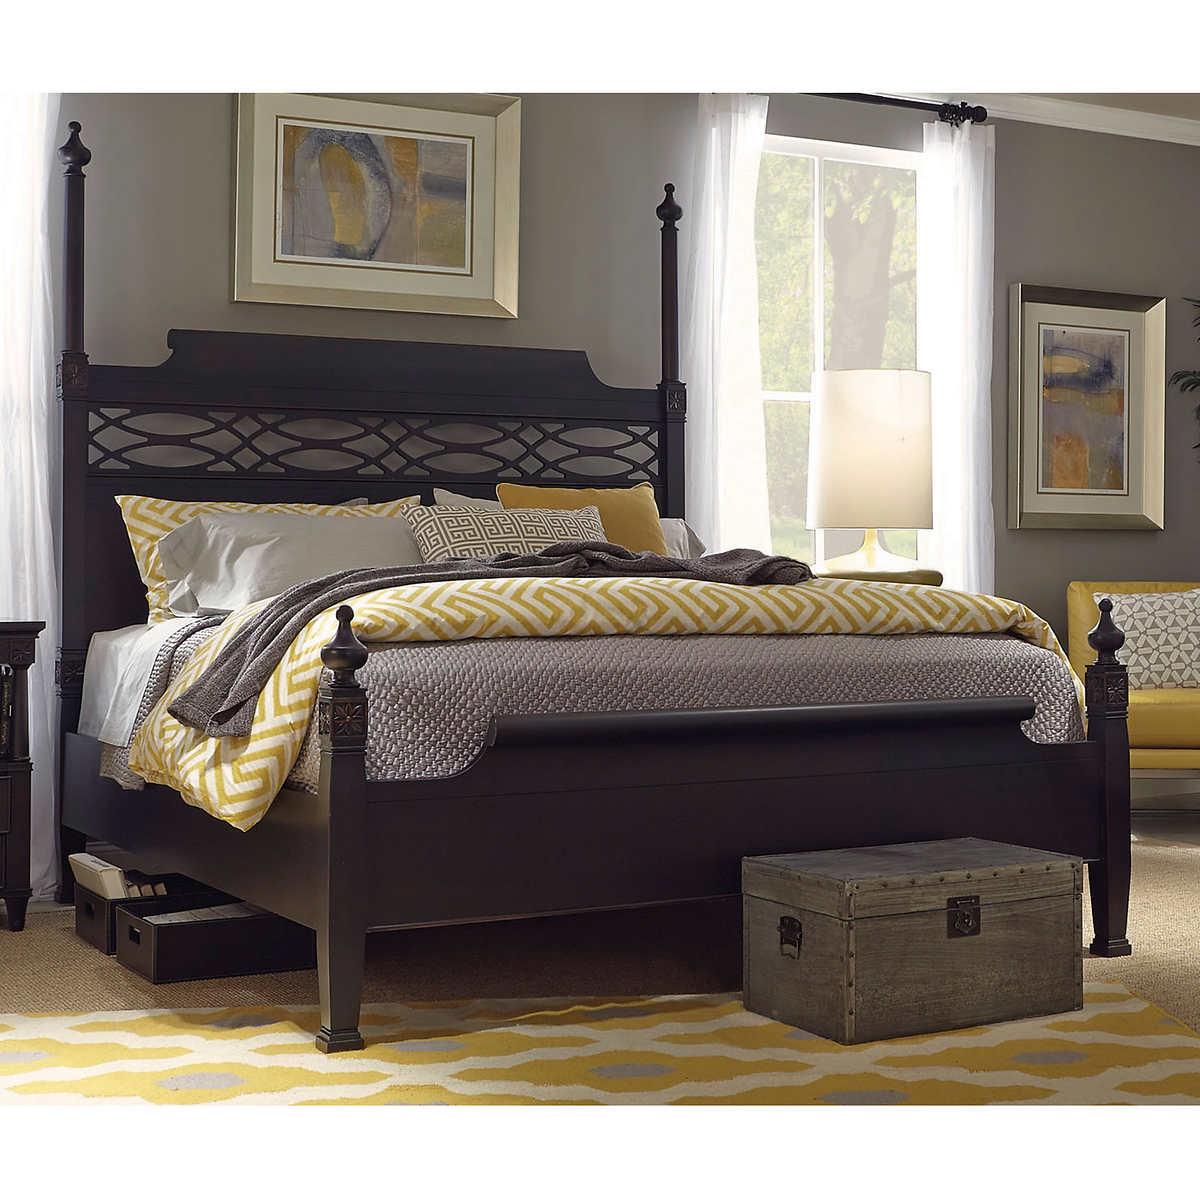 Liberty Bedroom Furniture Liberty